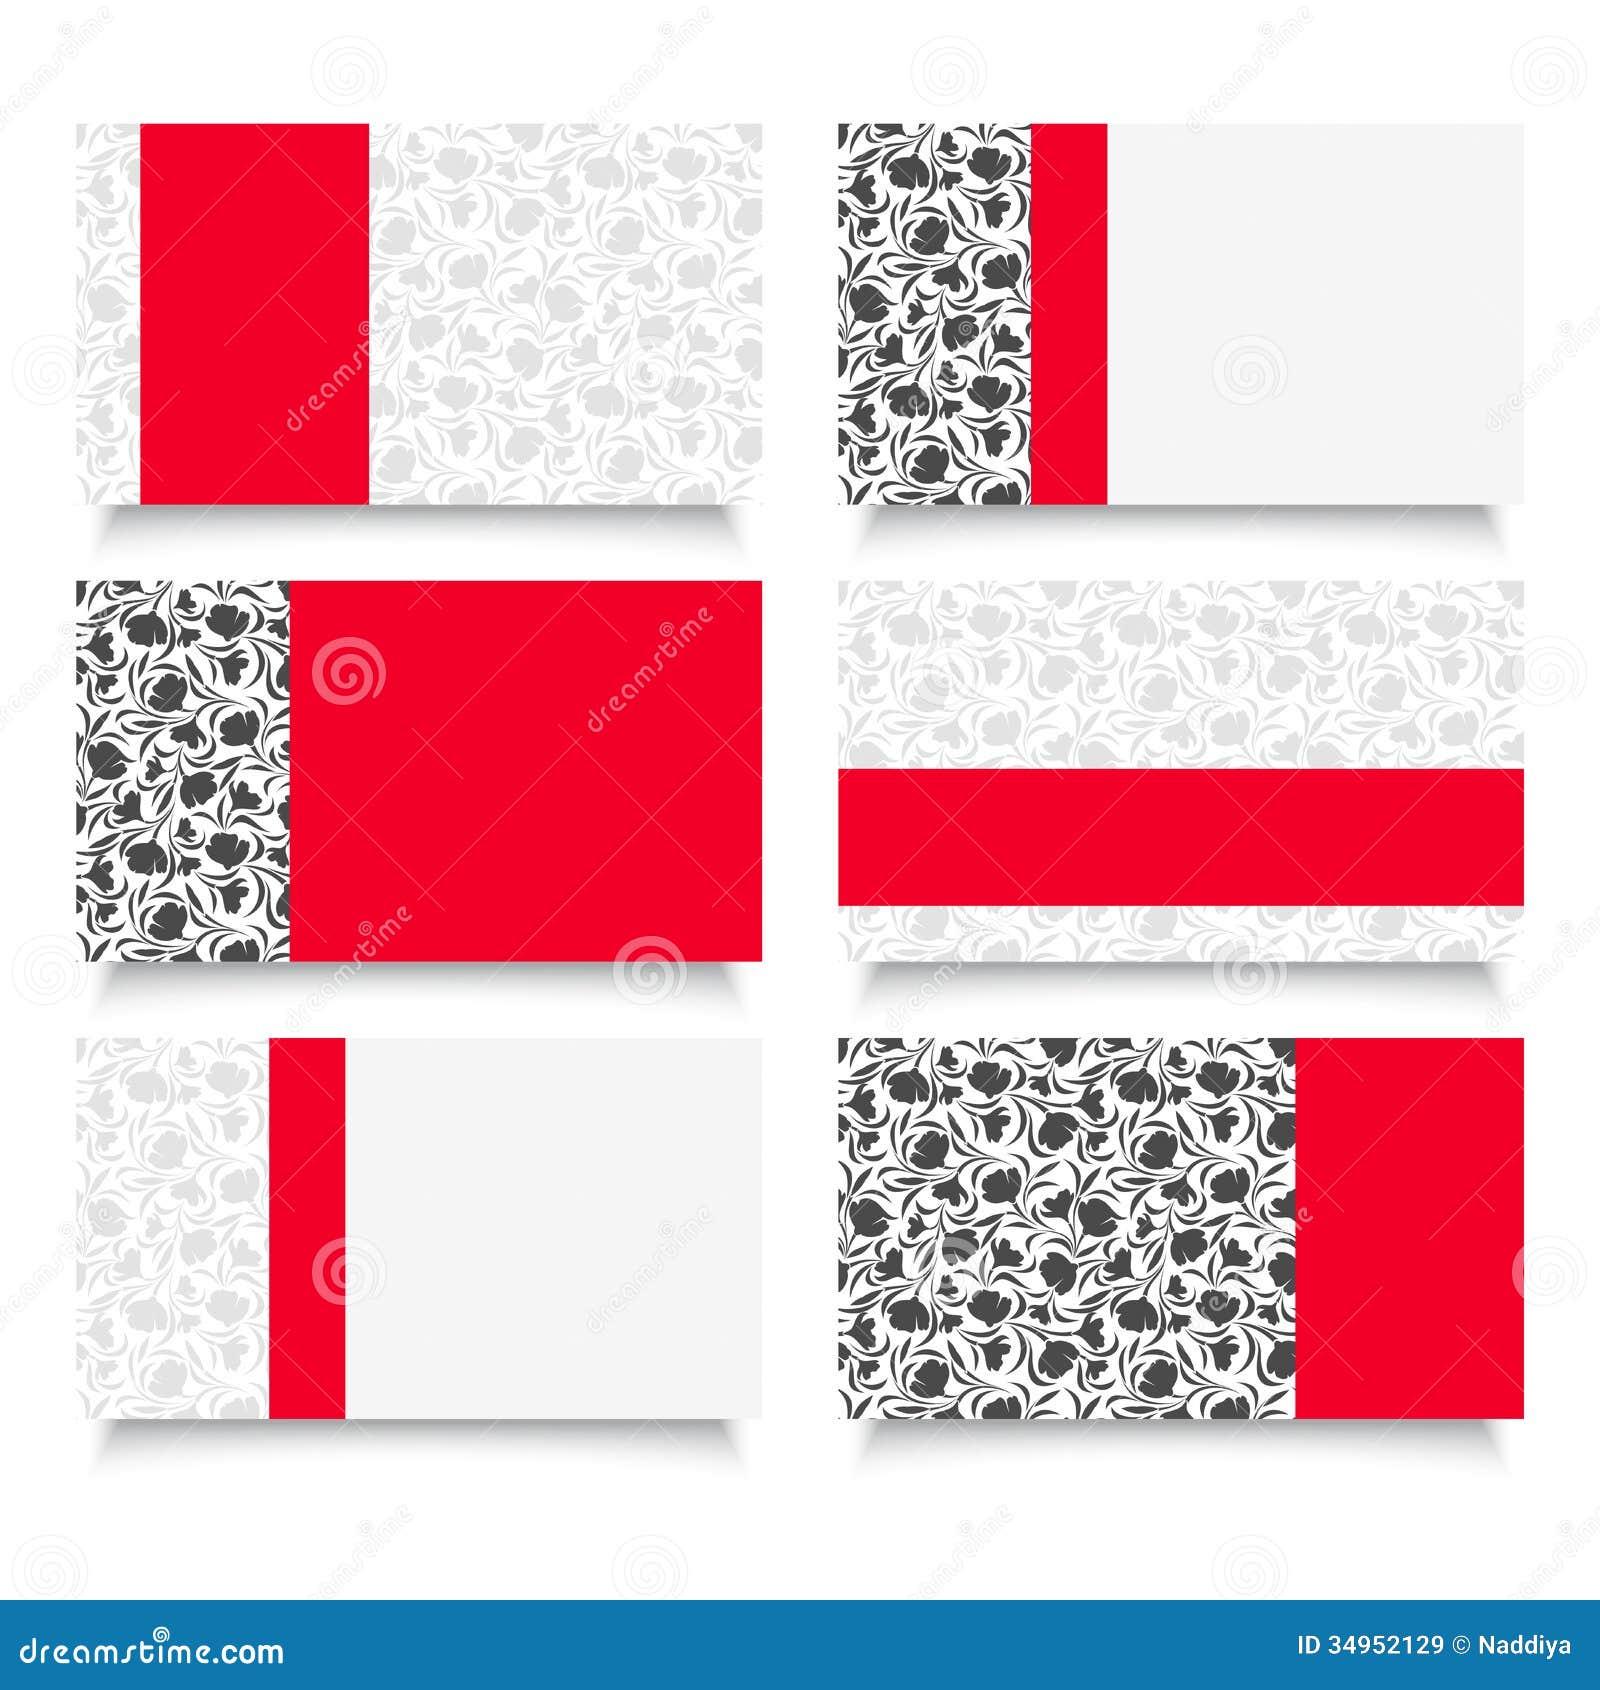 Blank Invitation Cards as amazing invitation example